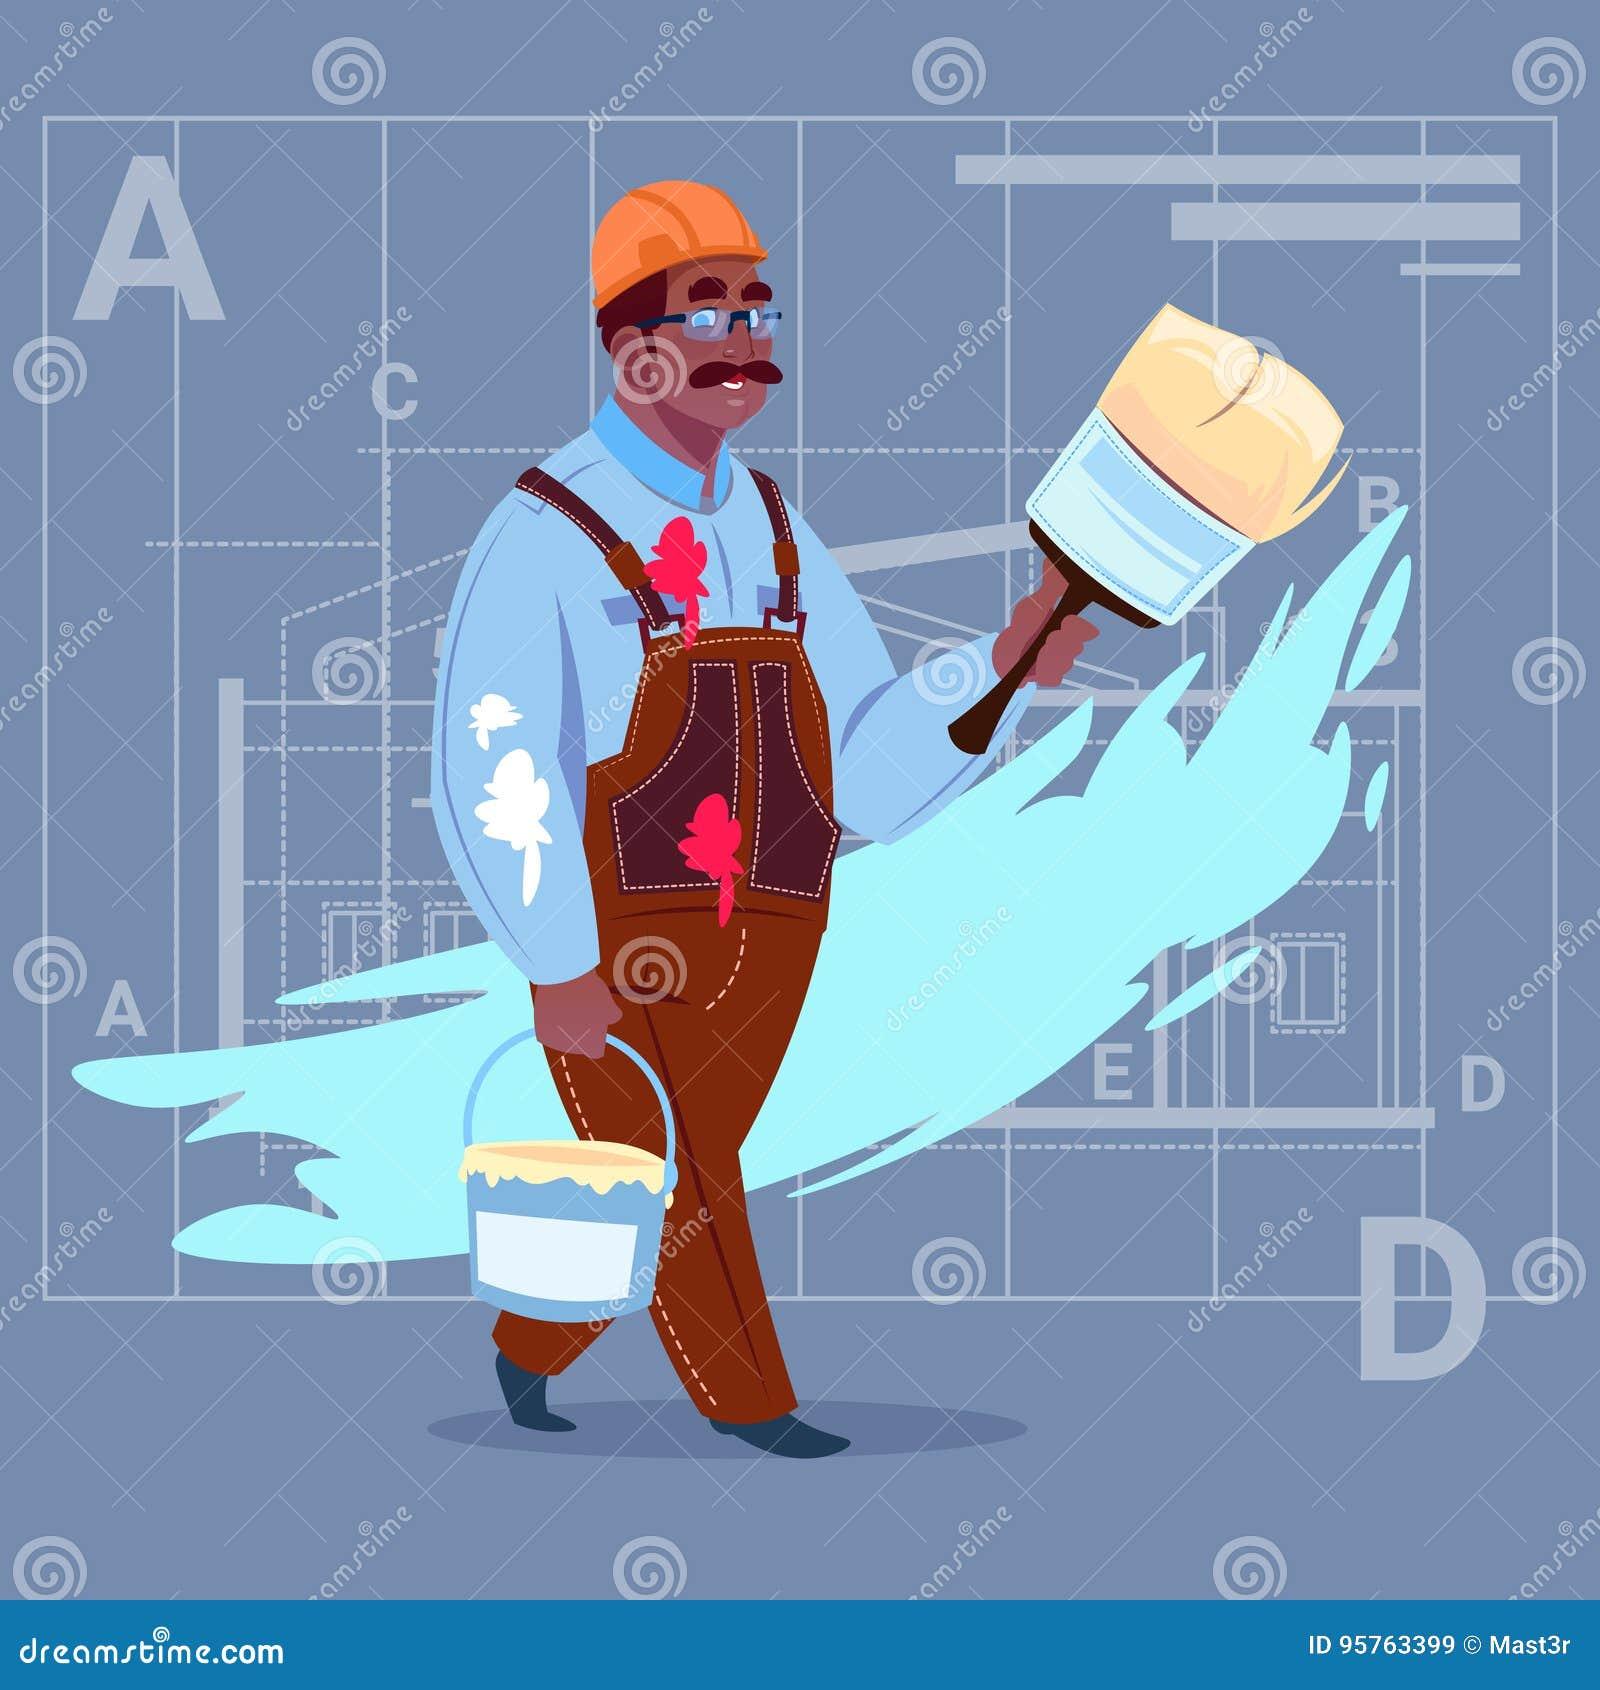 Capacete afro-americano de Wearing Uniform And do construtor do decorador de Hold Paint Brush do pintor dos desenhos animados